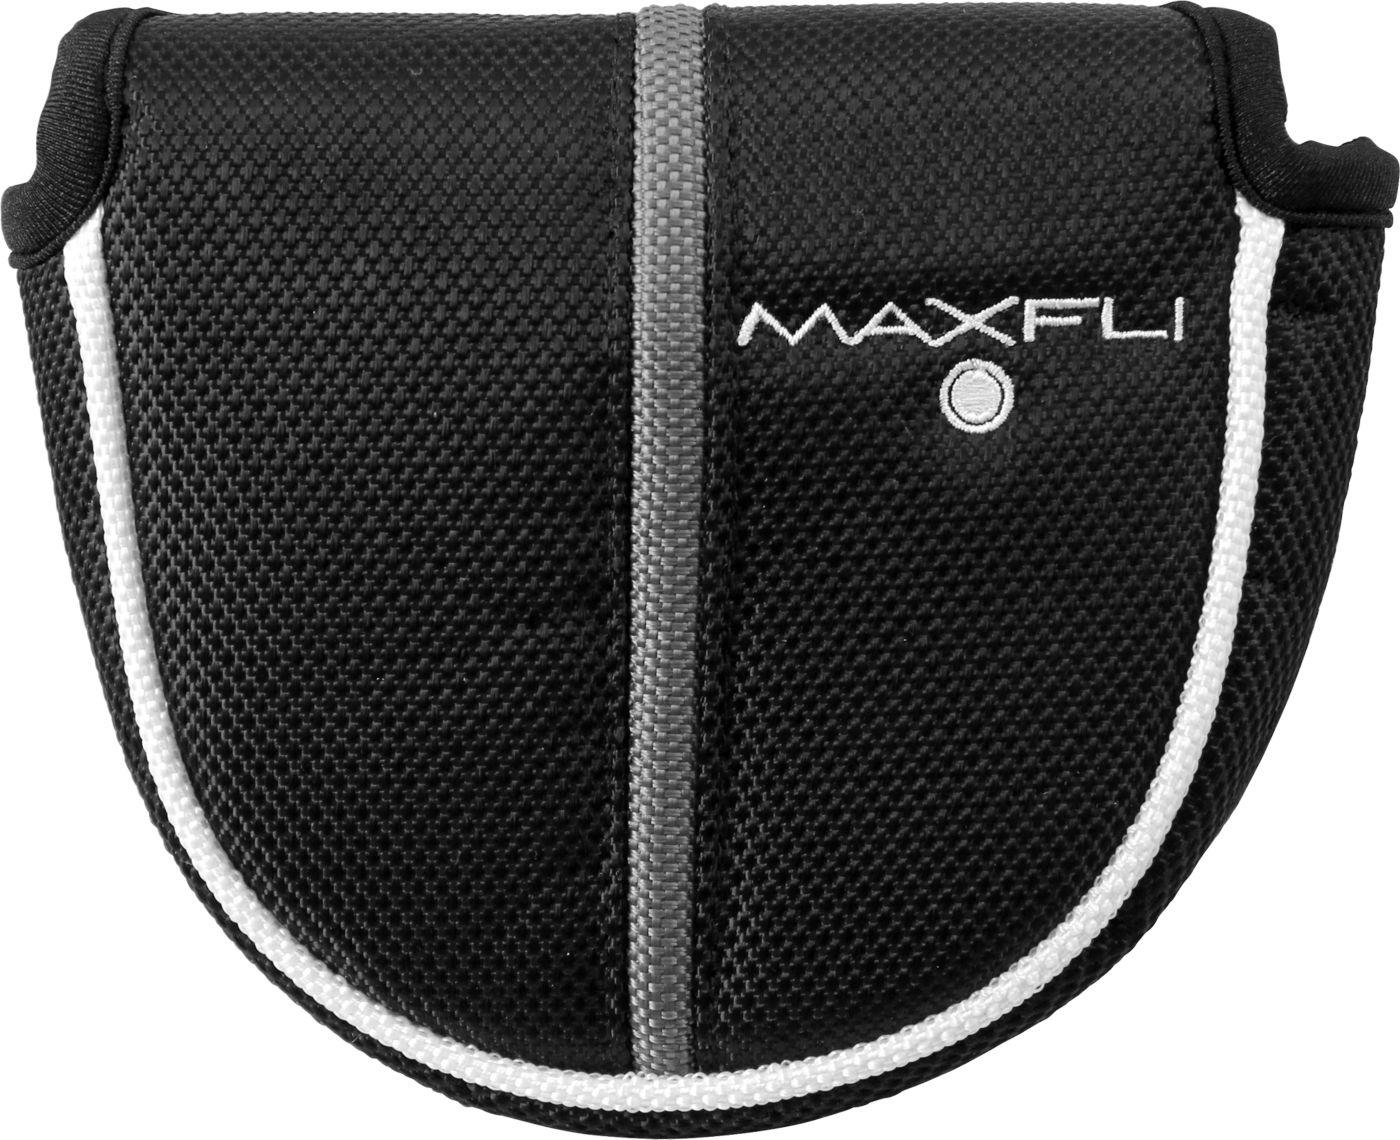 Maxfli Mallet Putter Cover